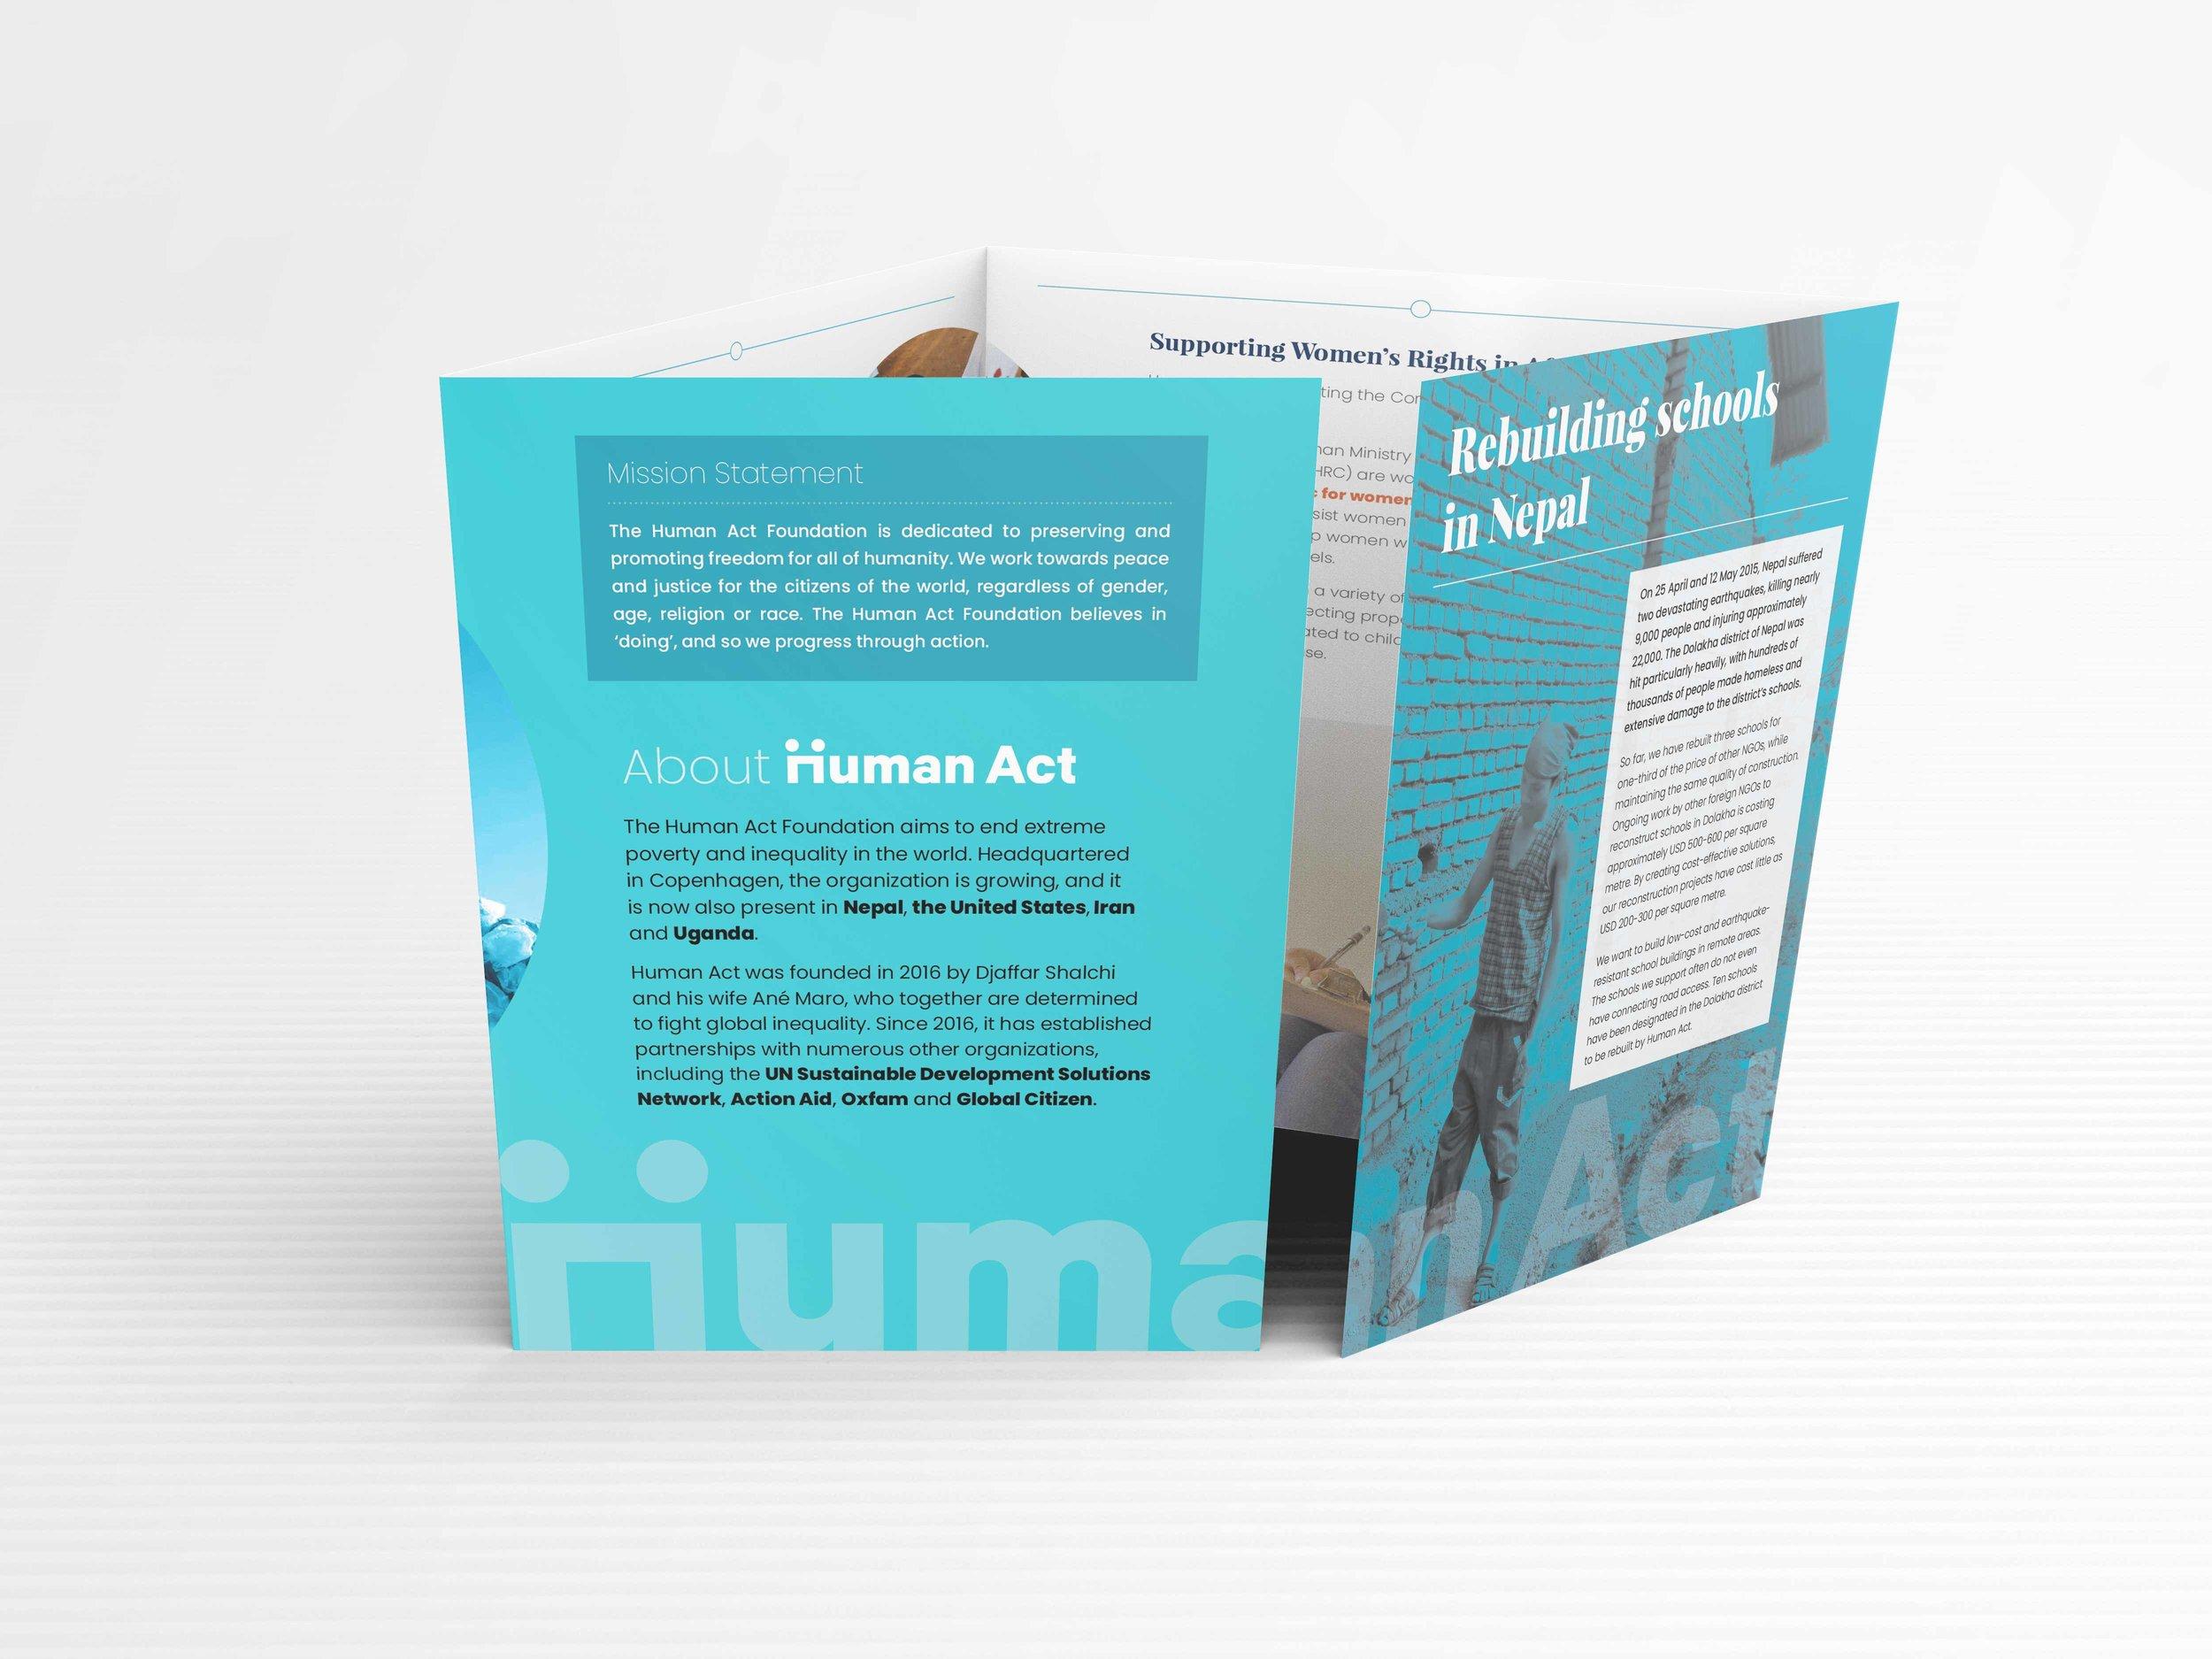 Human-Act-FLAPS.jpg